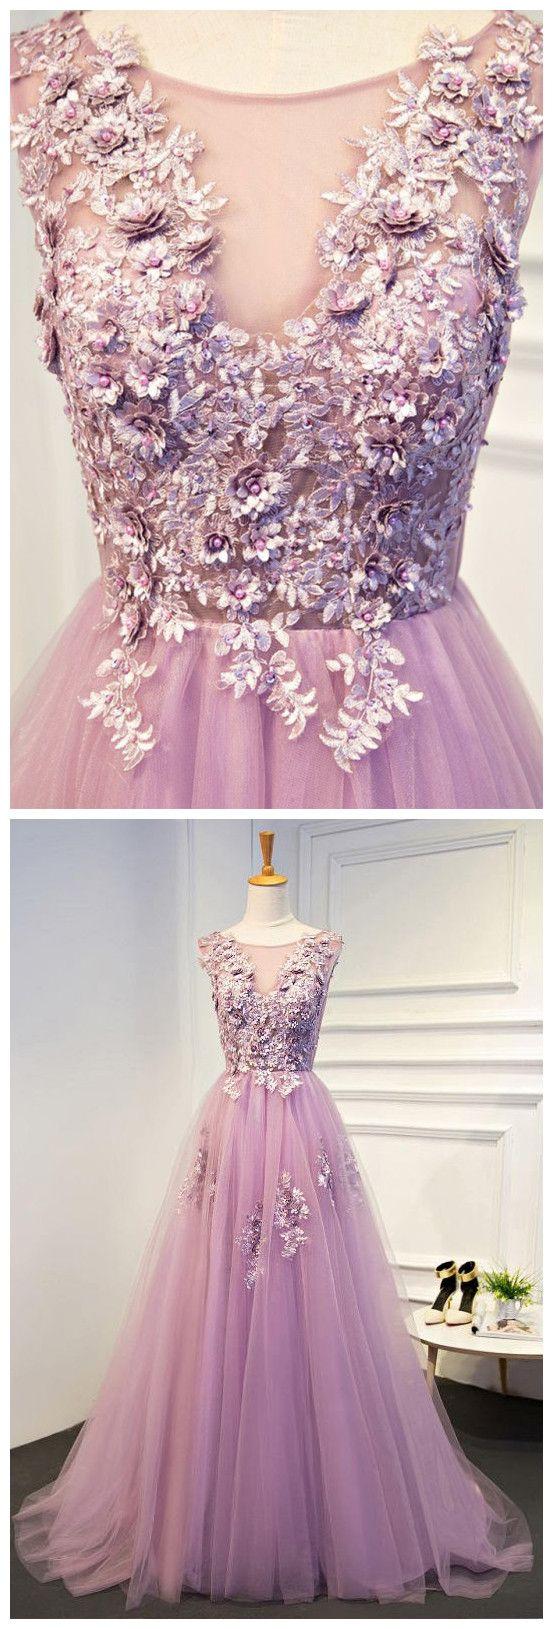 Pin de Sabina en Prom dresses | Pinterest | Vestiditos, Vestidos de ...